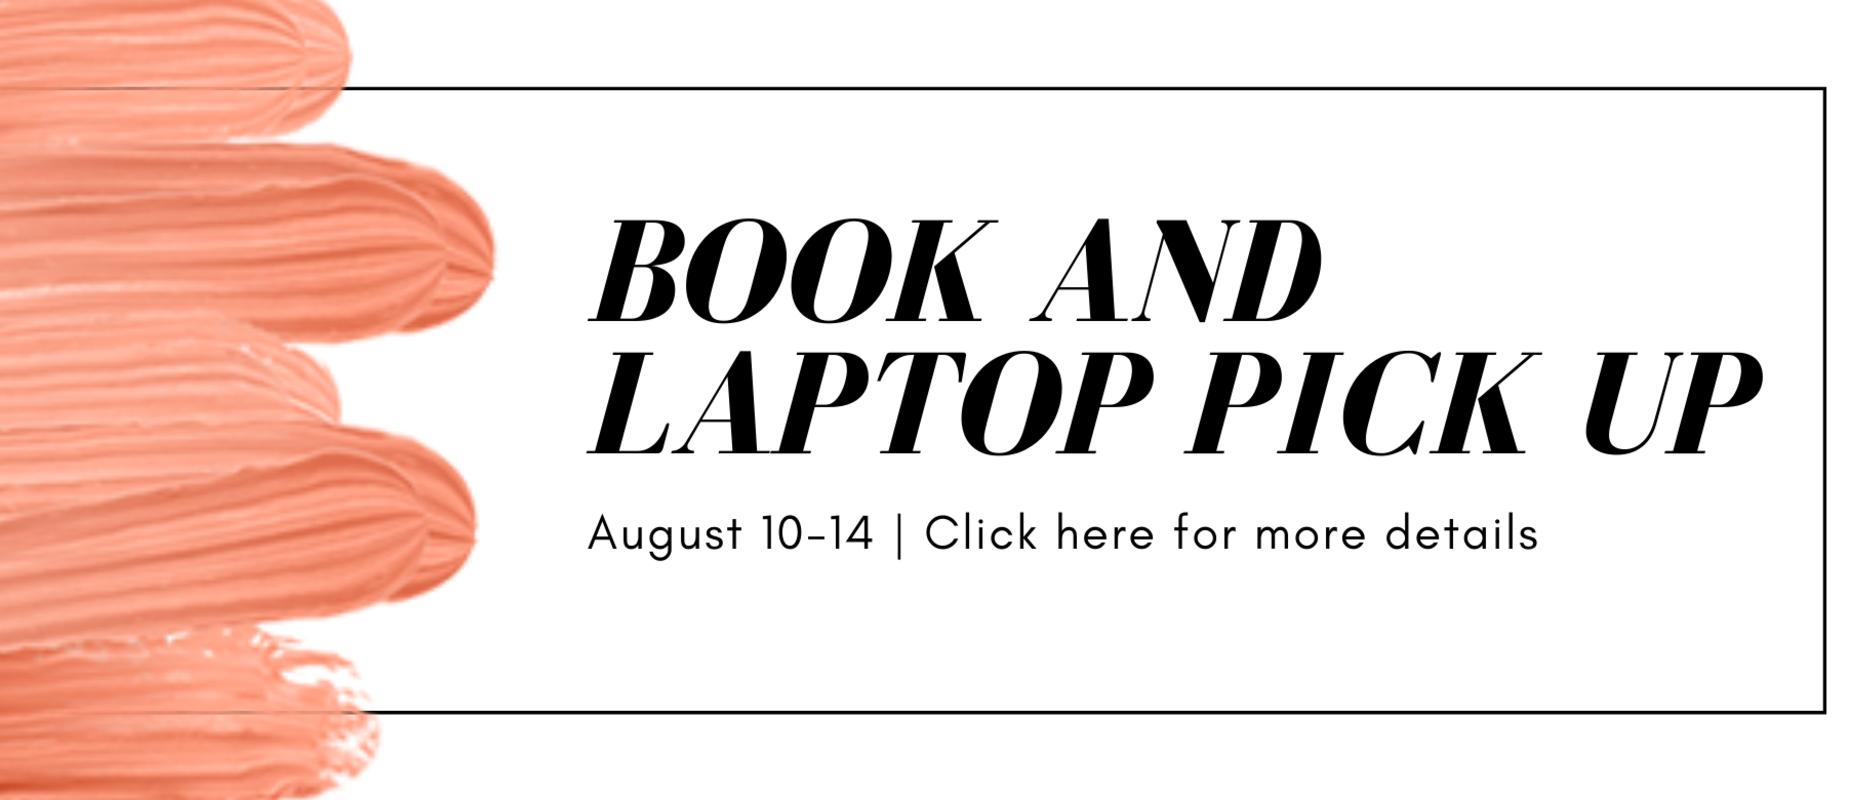 book laptop pick up 8/10-14